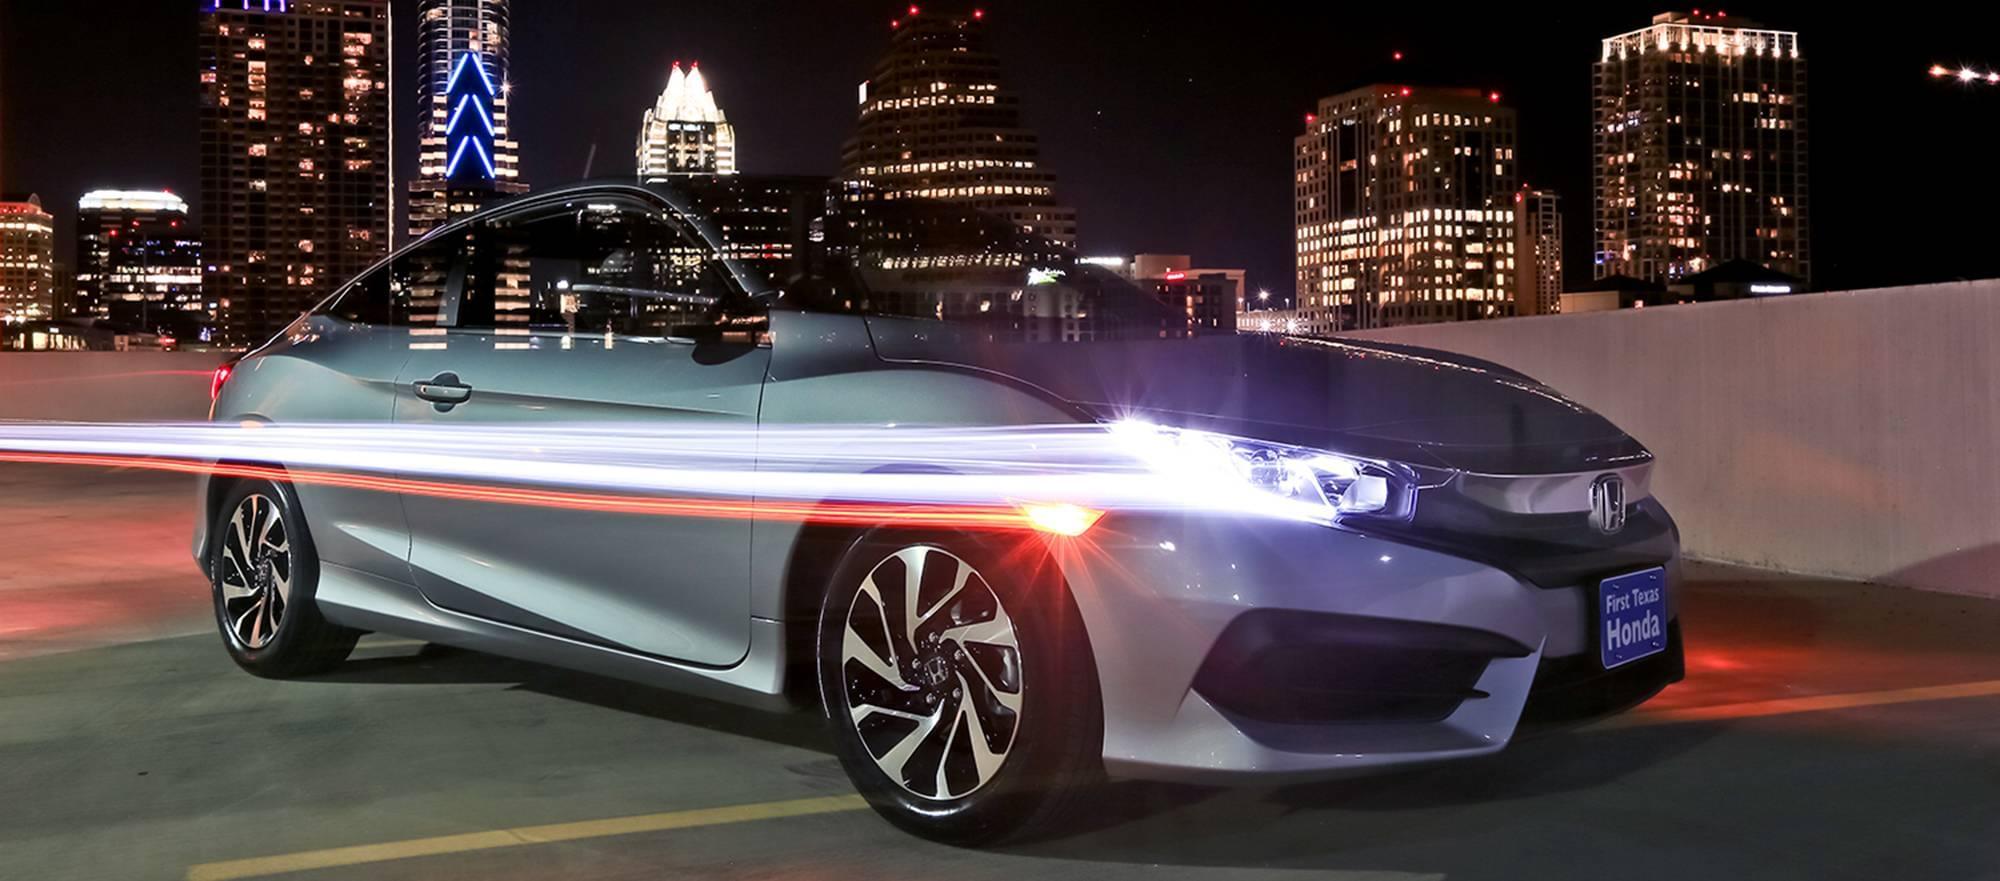 First Texas Honda | New Honda Civic Inventory in Austin, TX